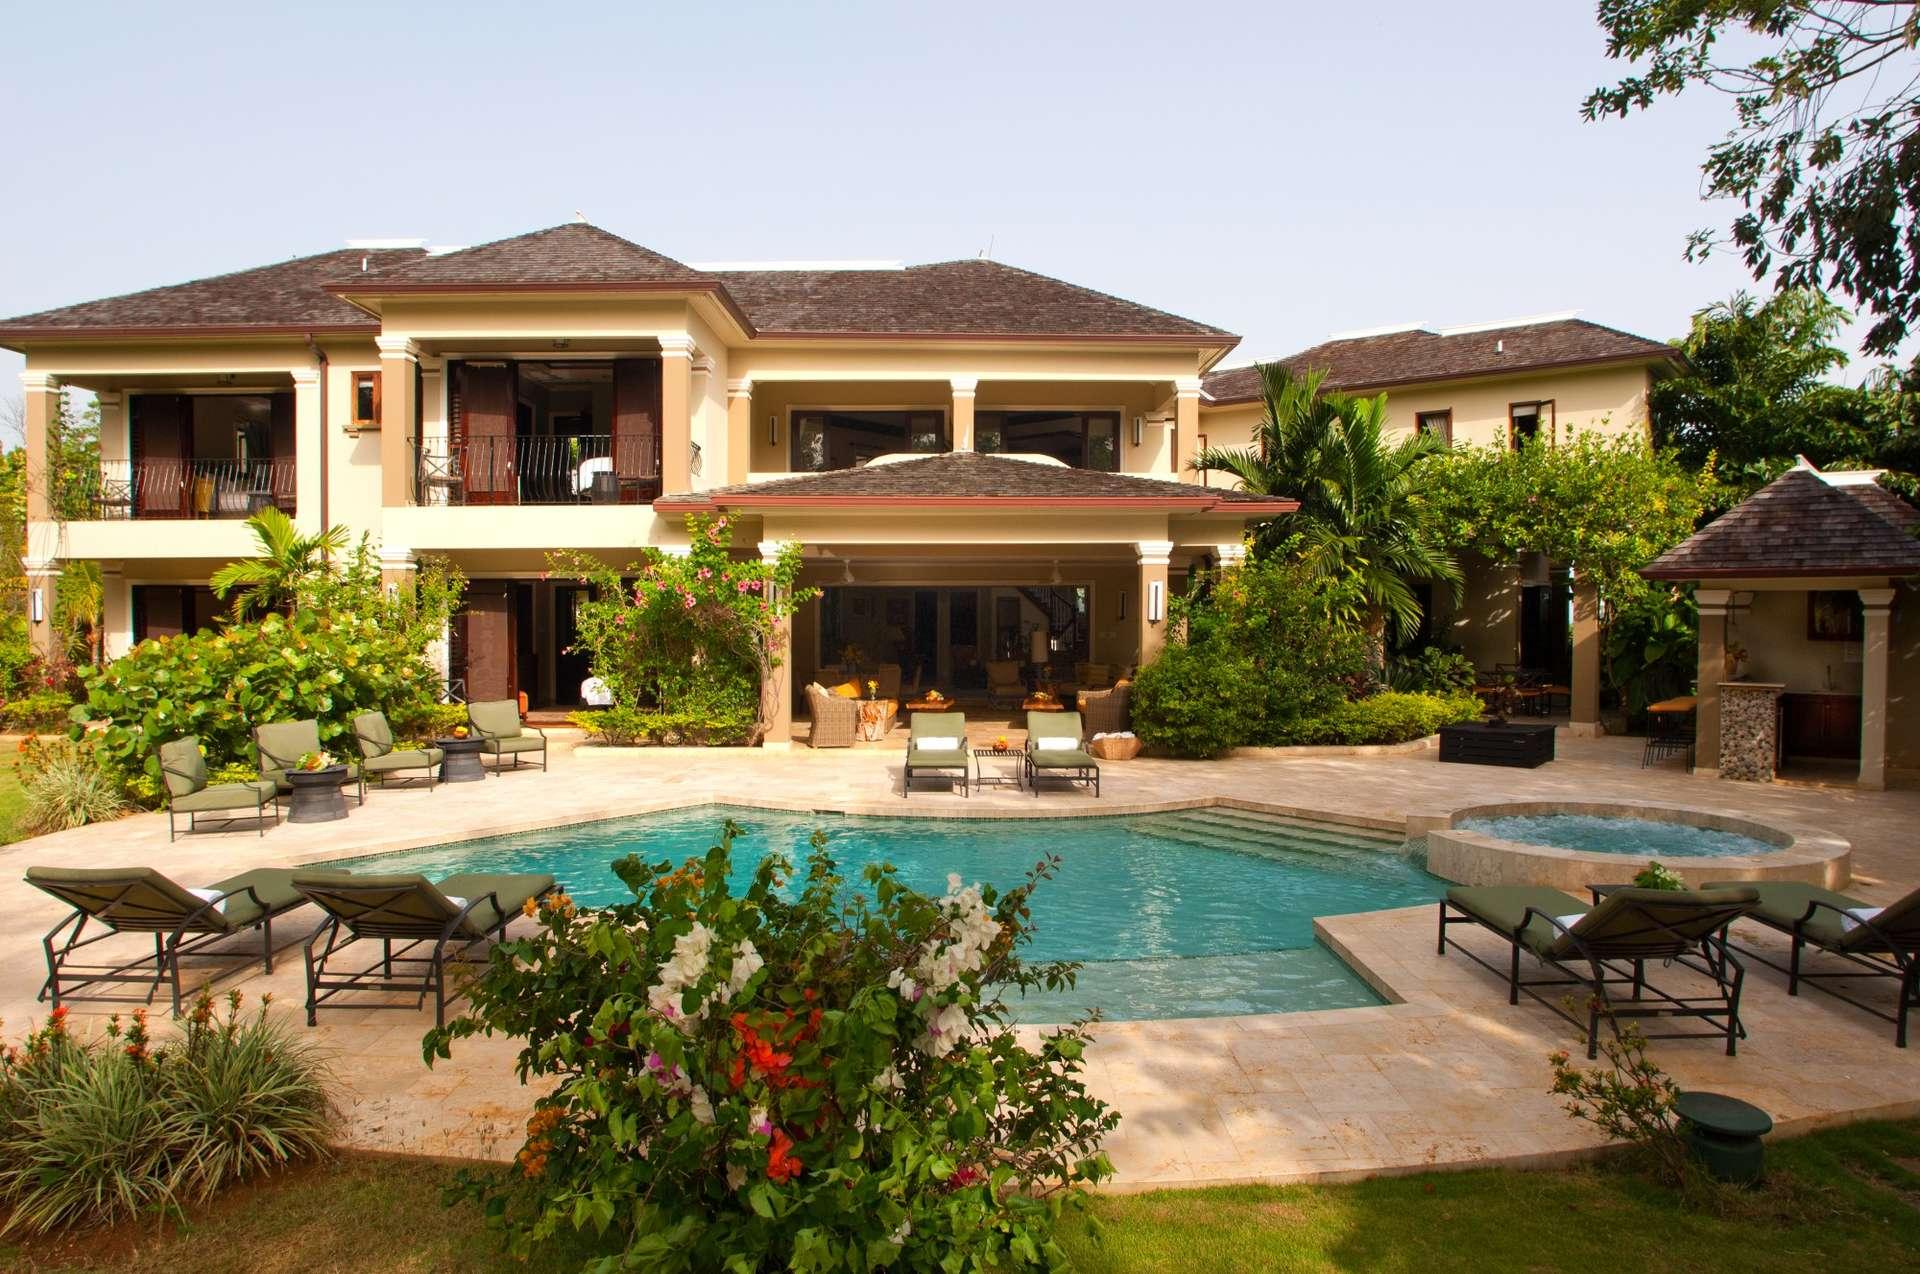 Luxury villa rentals caribbean - Jamaica - Montego bay - No location 4 - Tek Time - Image 1/17